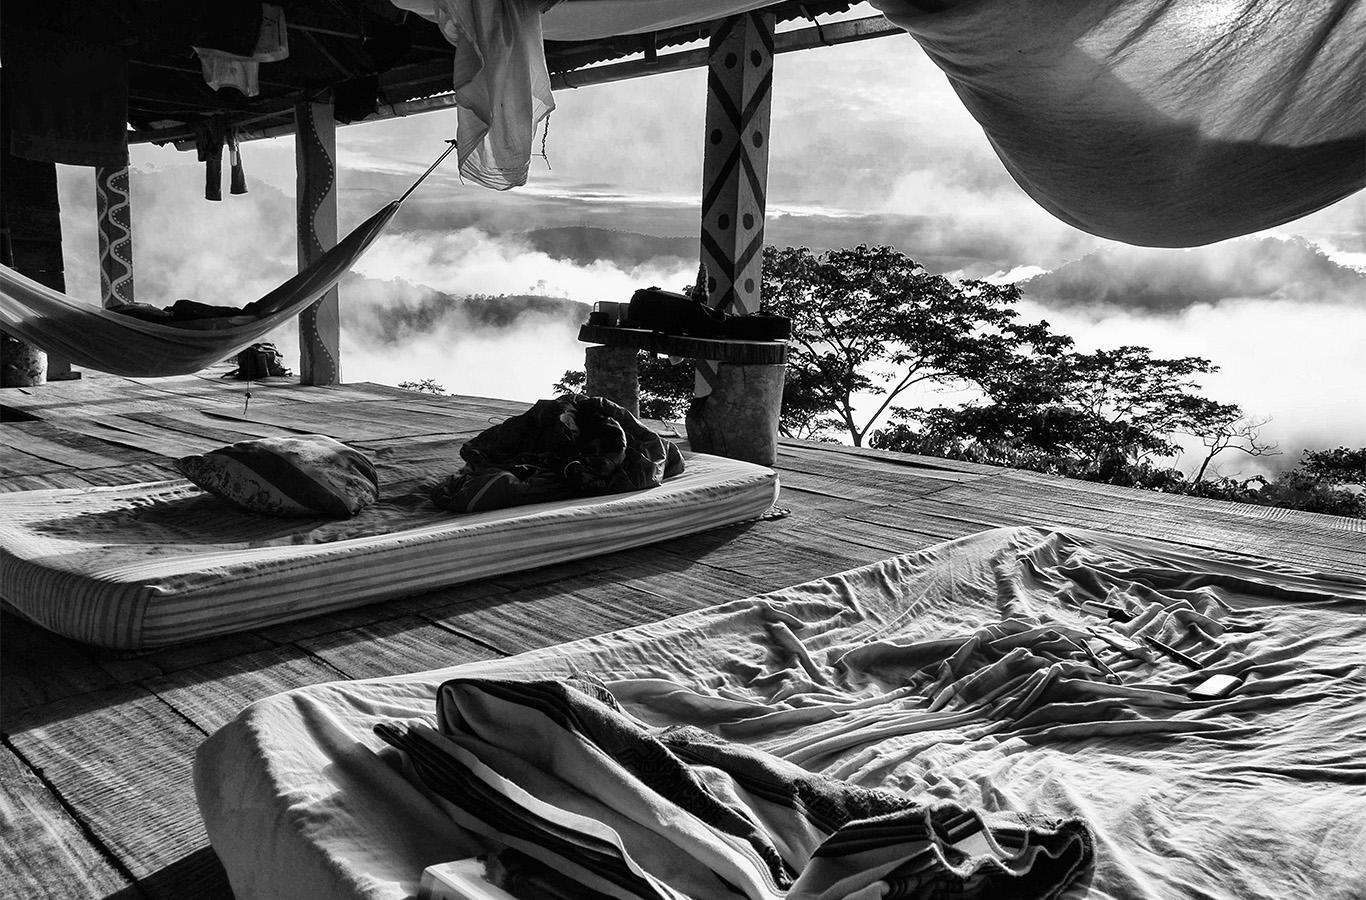 The sun rises over Enamórate in the Selva Central, or central jungle region, of Peru